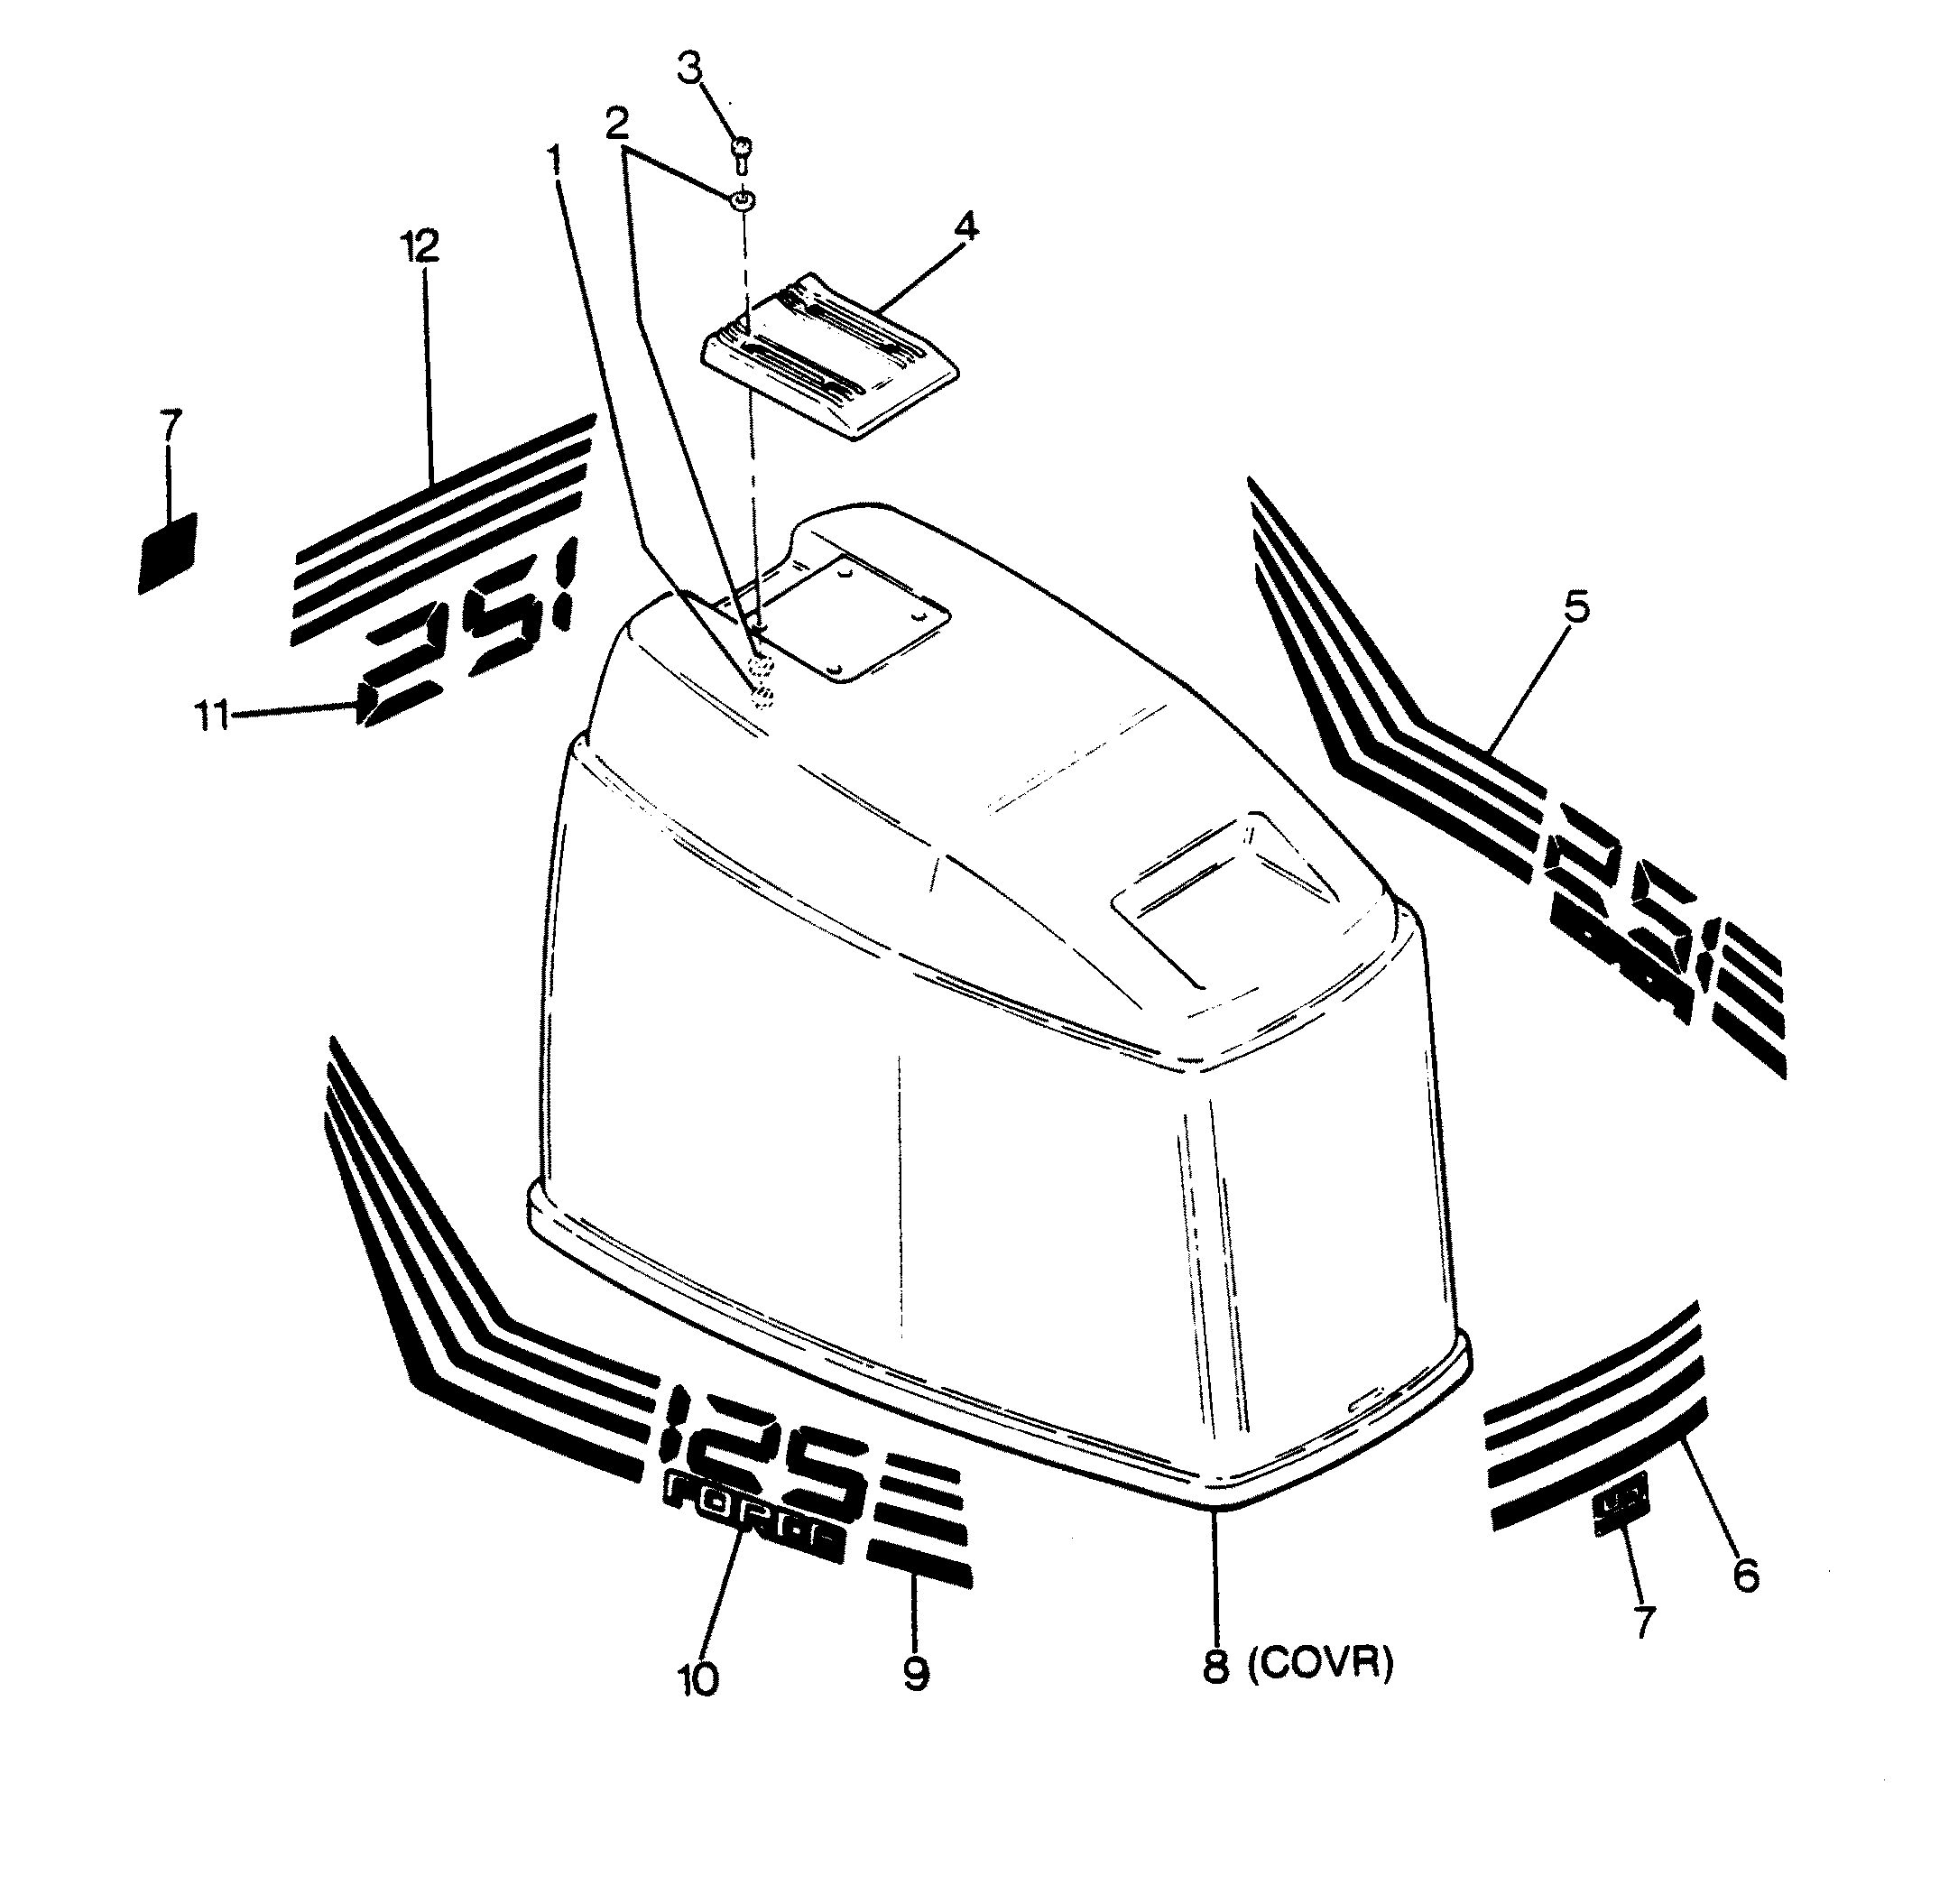 1989 polaris snowmobile parts diagram